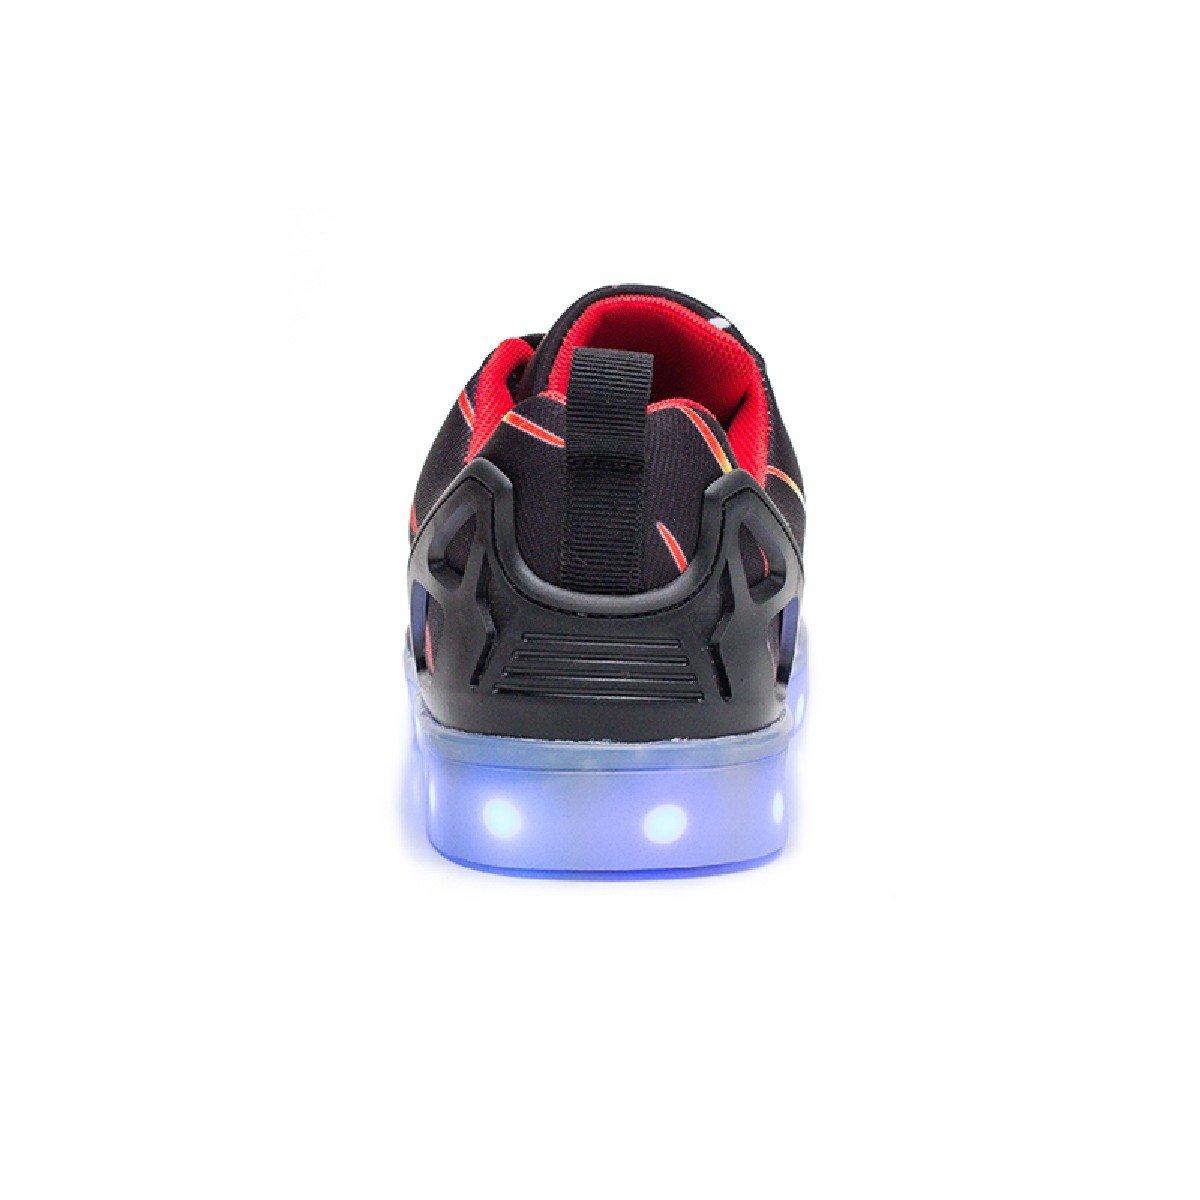 Juren Kid Boy Girl Upgraded USB Charging LED Light Sport Shoes Flashing Fashion Sneakers